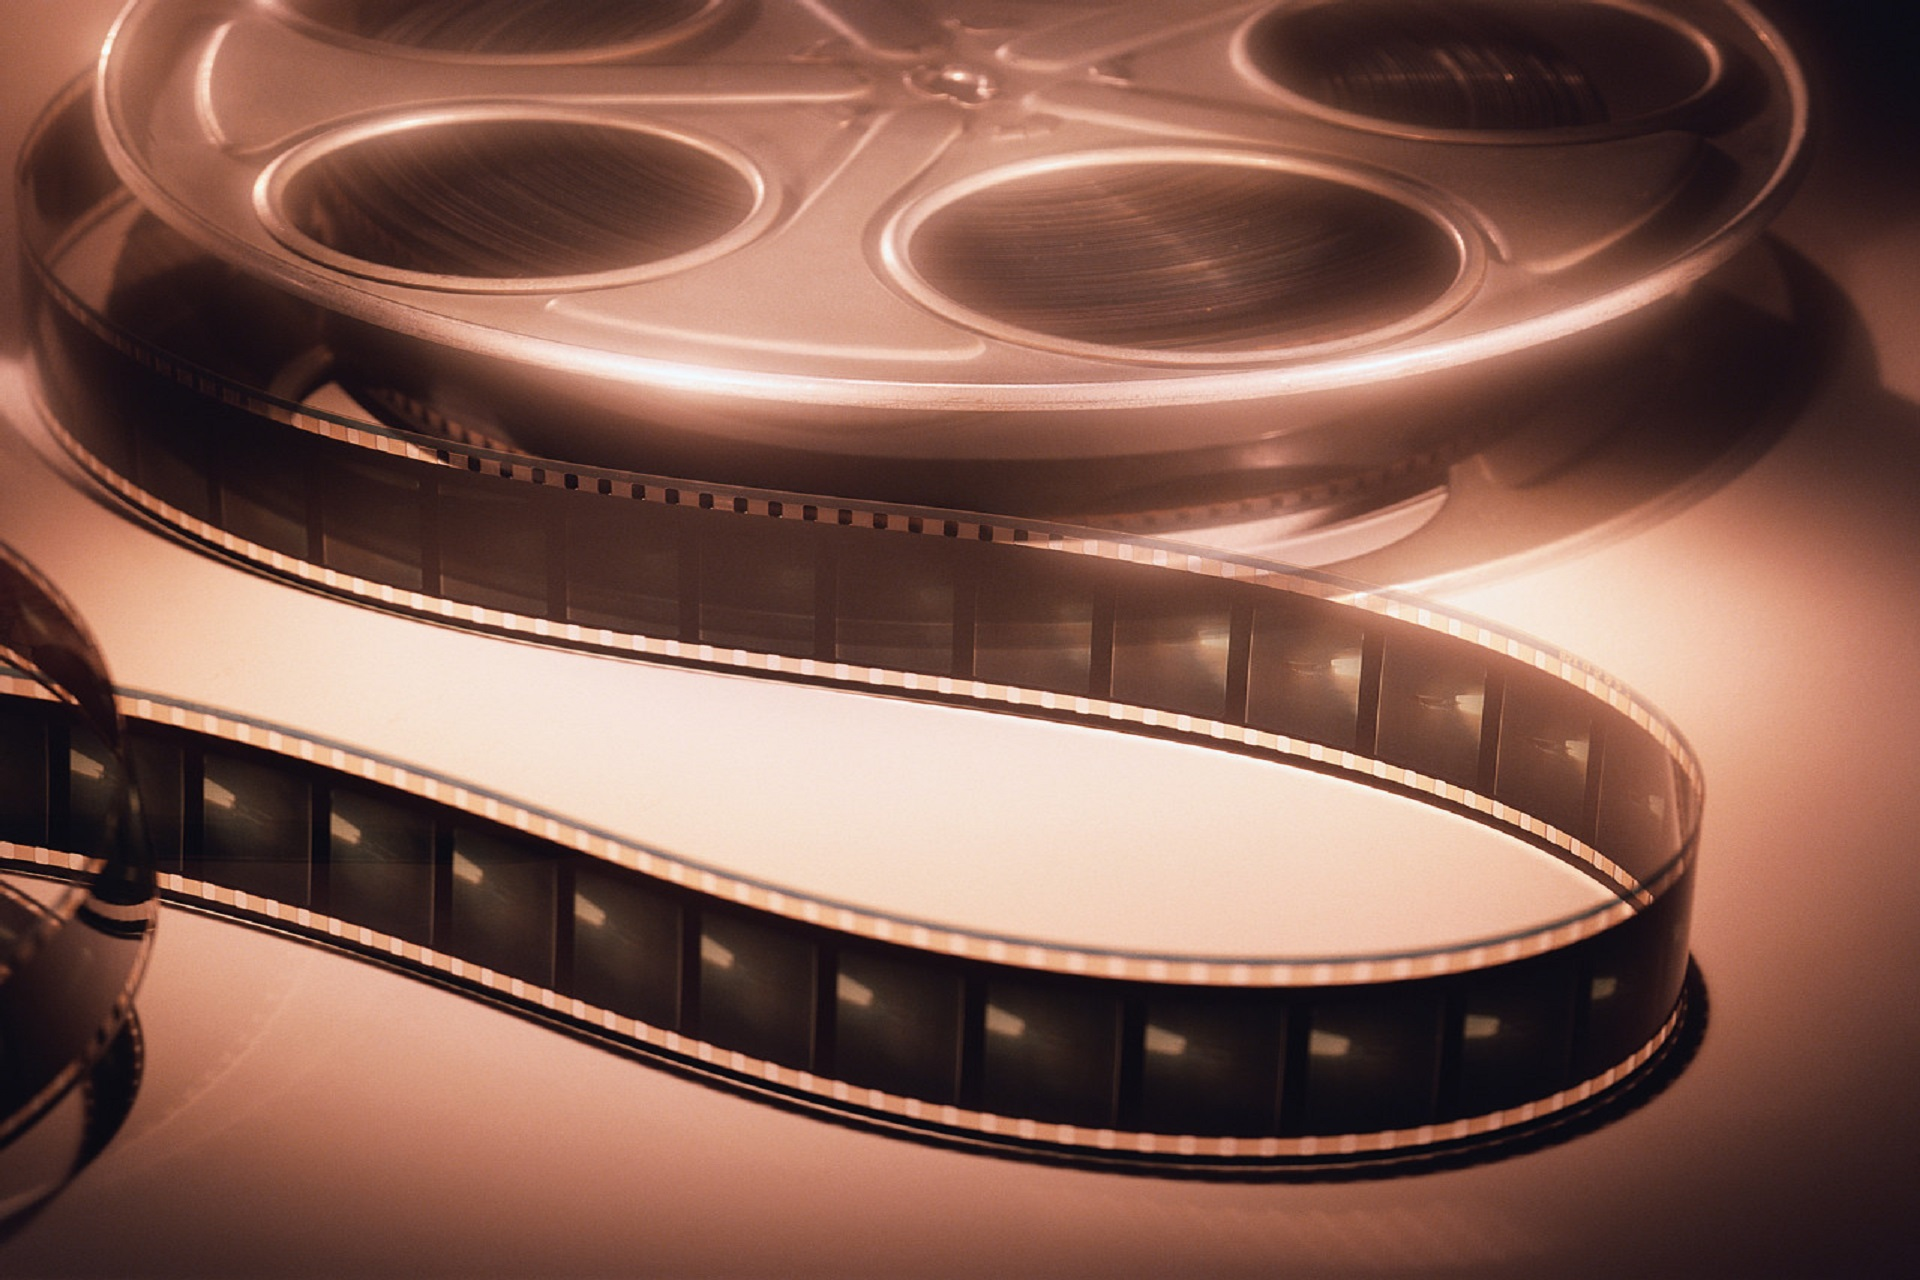 Cineforum Residenza Sanitaria Assistenziale Santuario | Opere Sociali Servizi Savona